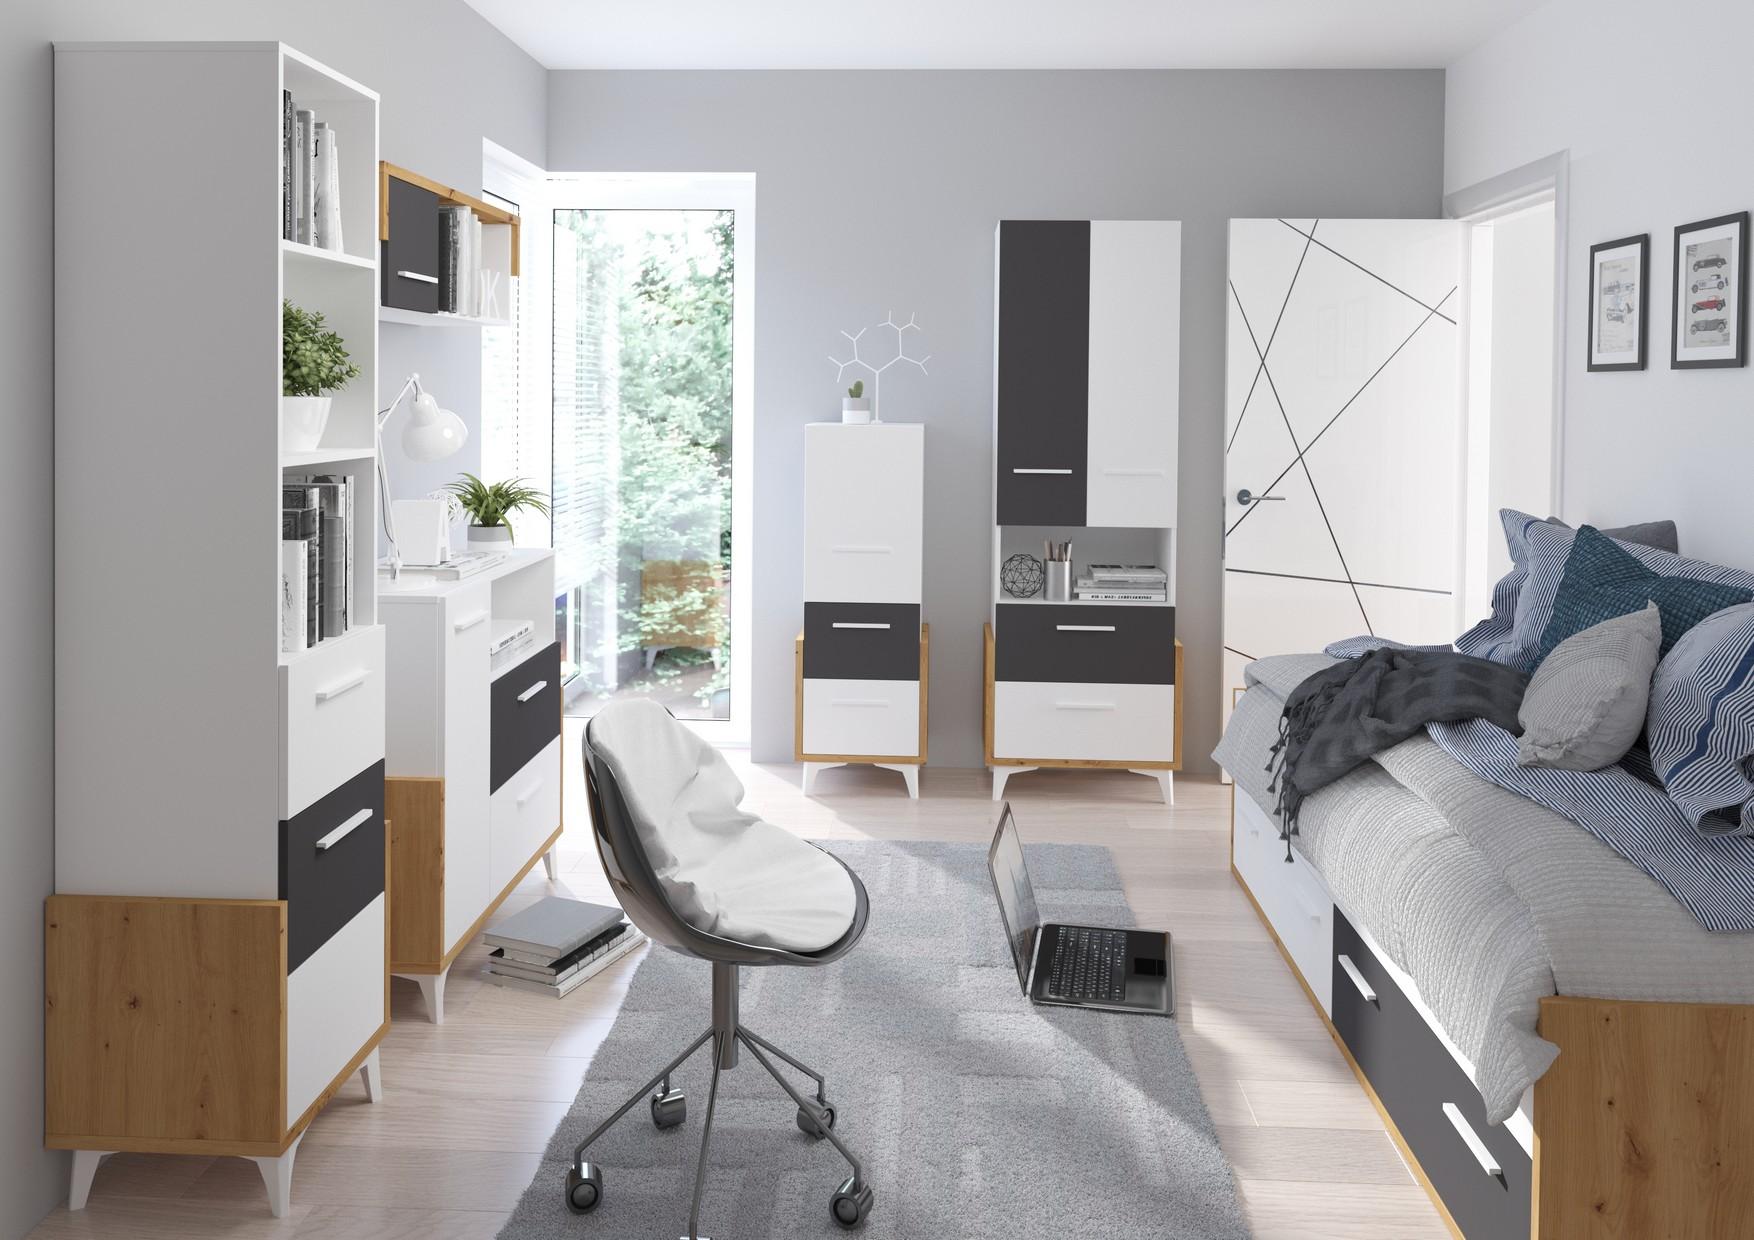 WIP Detská izba HEY 3 Farba: Dub artisan/biela/grafit